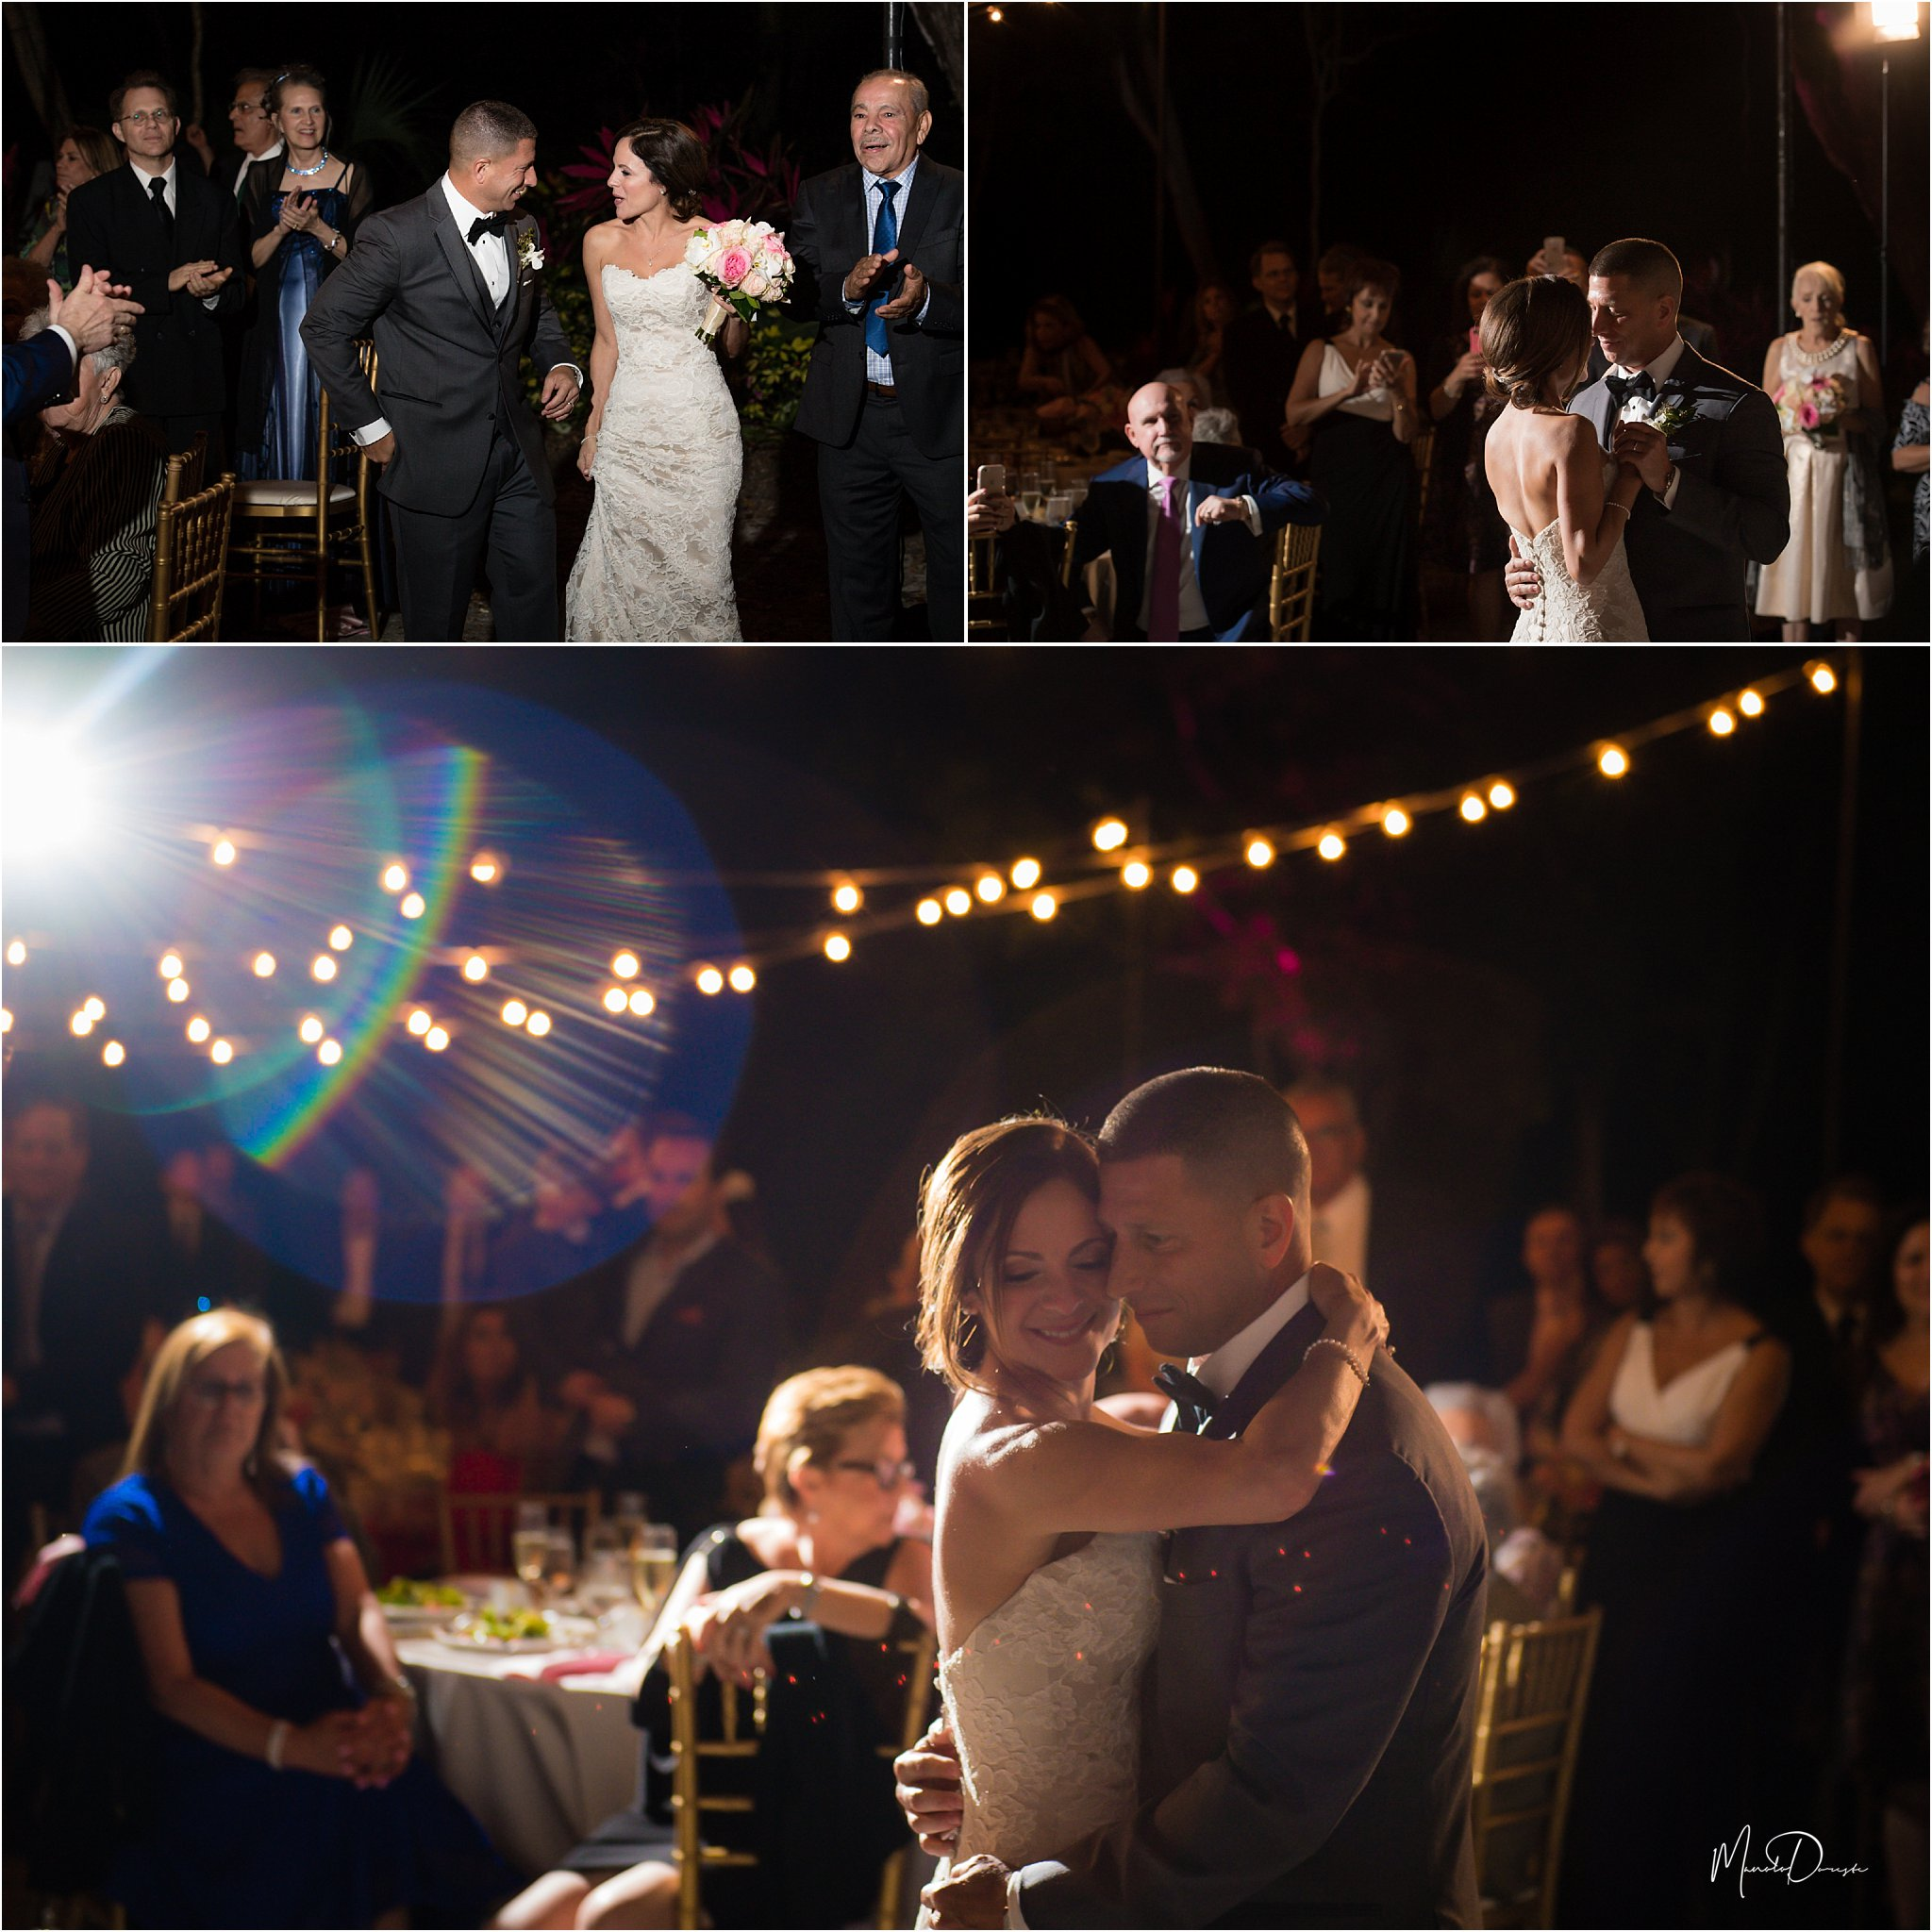 00845_ManoloDoreste_InFocusStudios_Wedding_Family_Photography_Miami_MiamiPhotographer.jpg